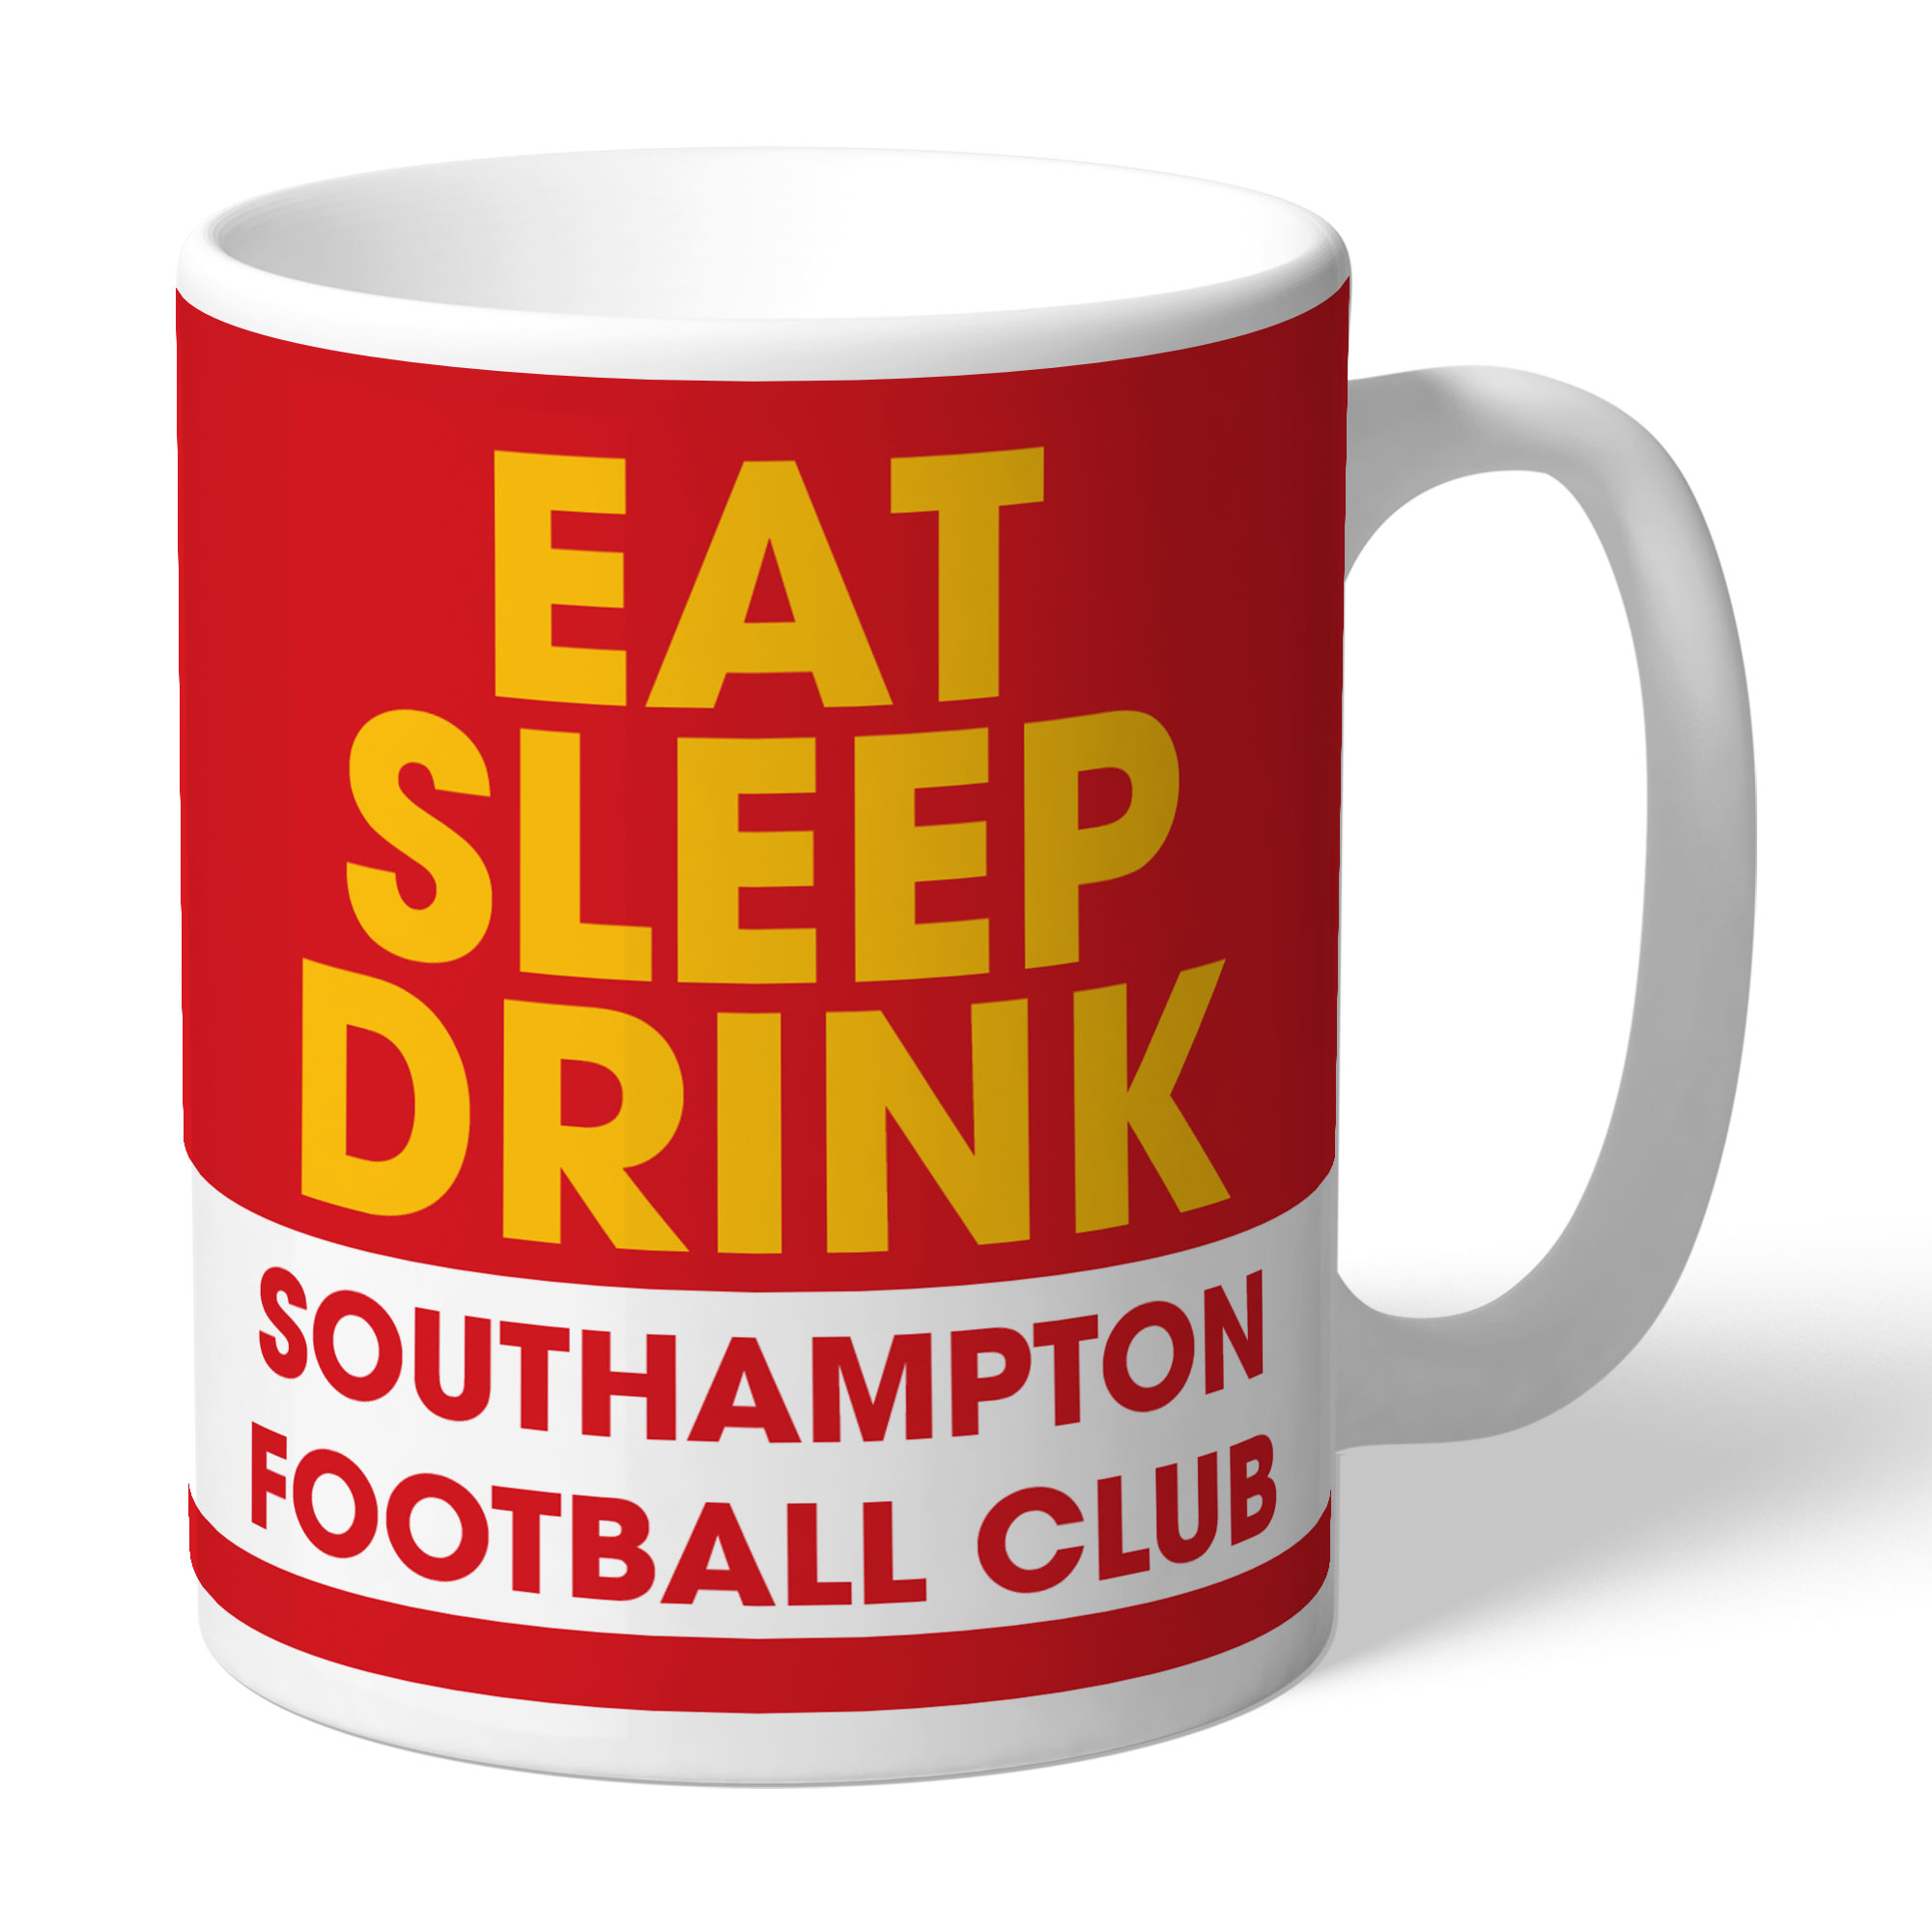 Southampton FC Eat Sleep Drink Mug